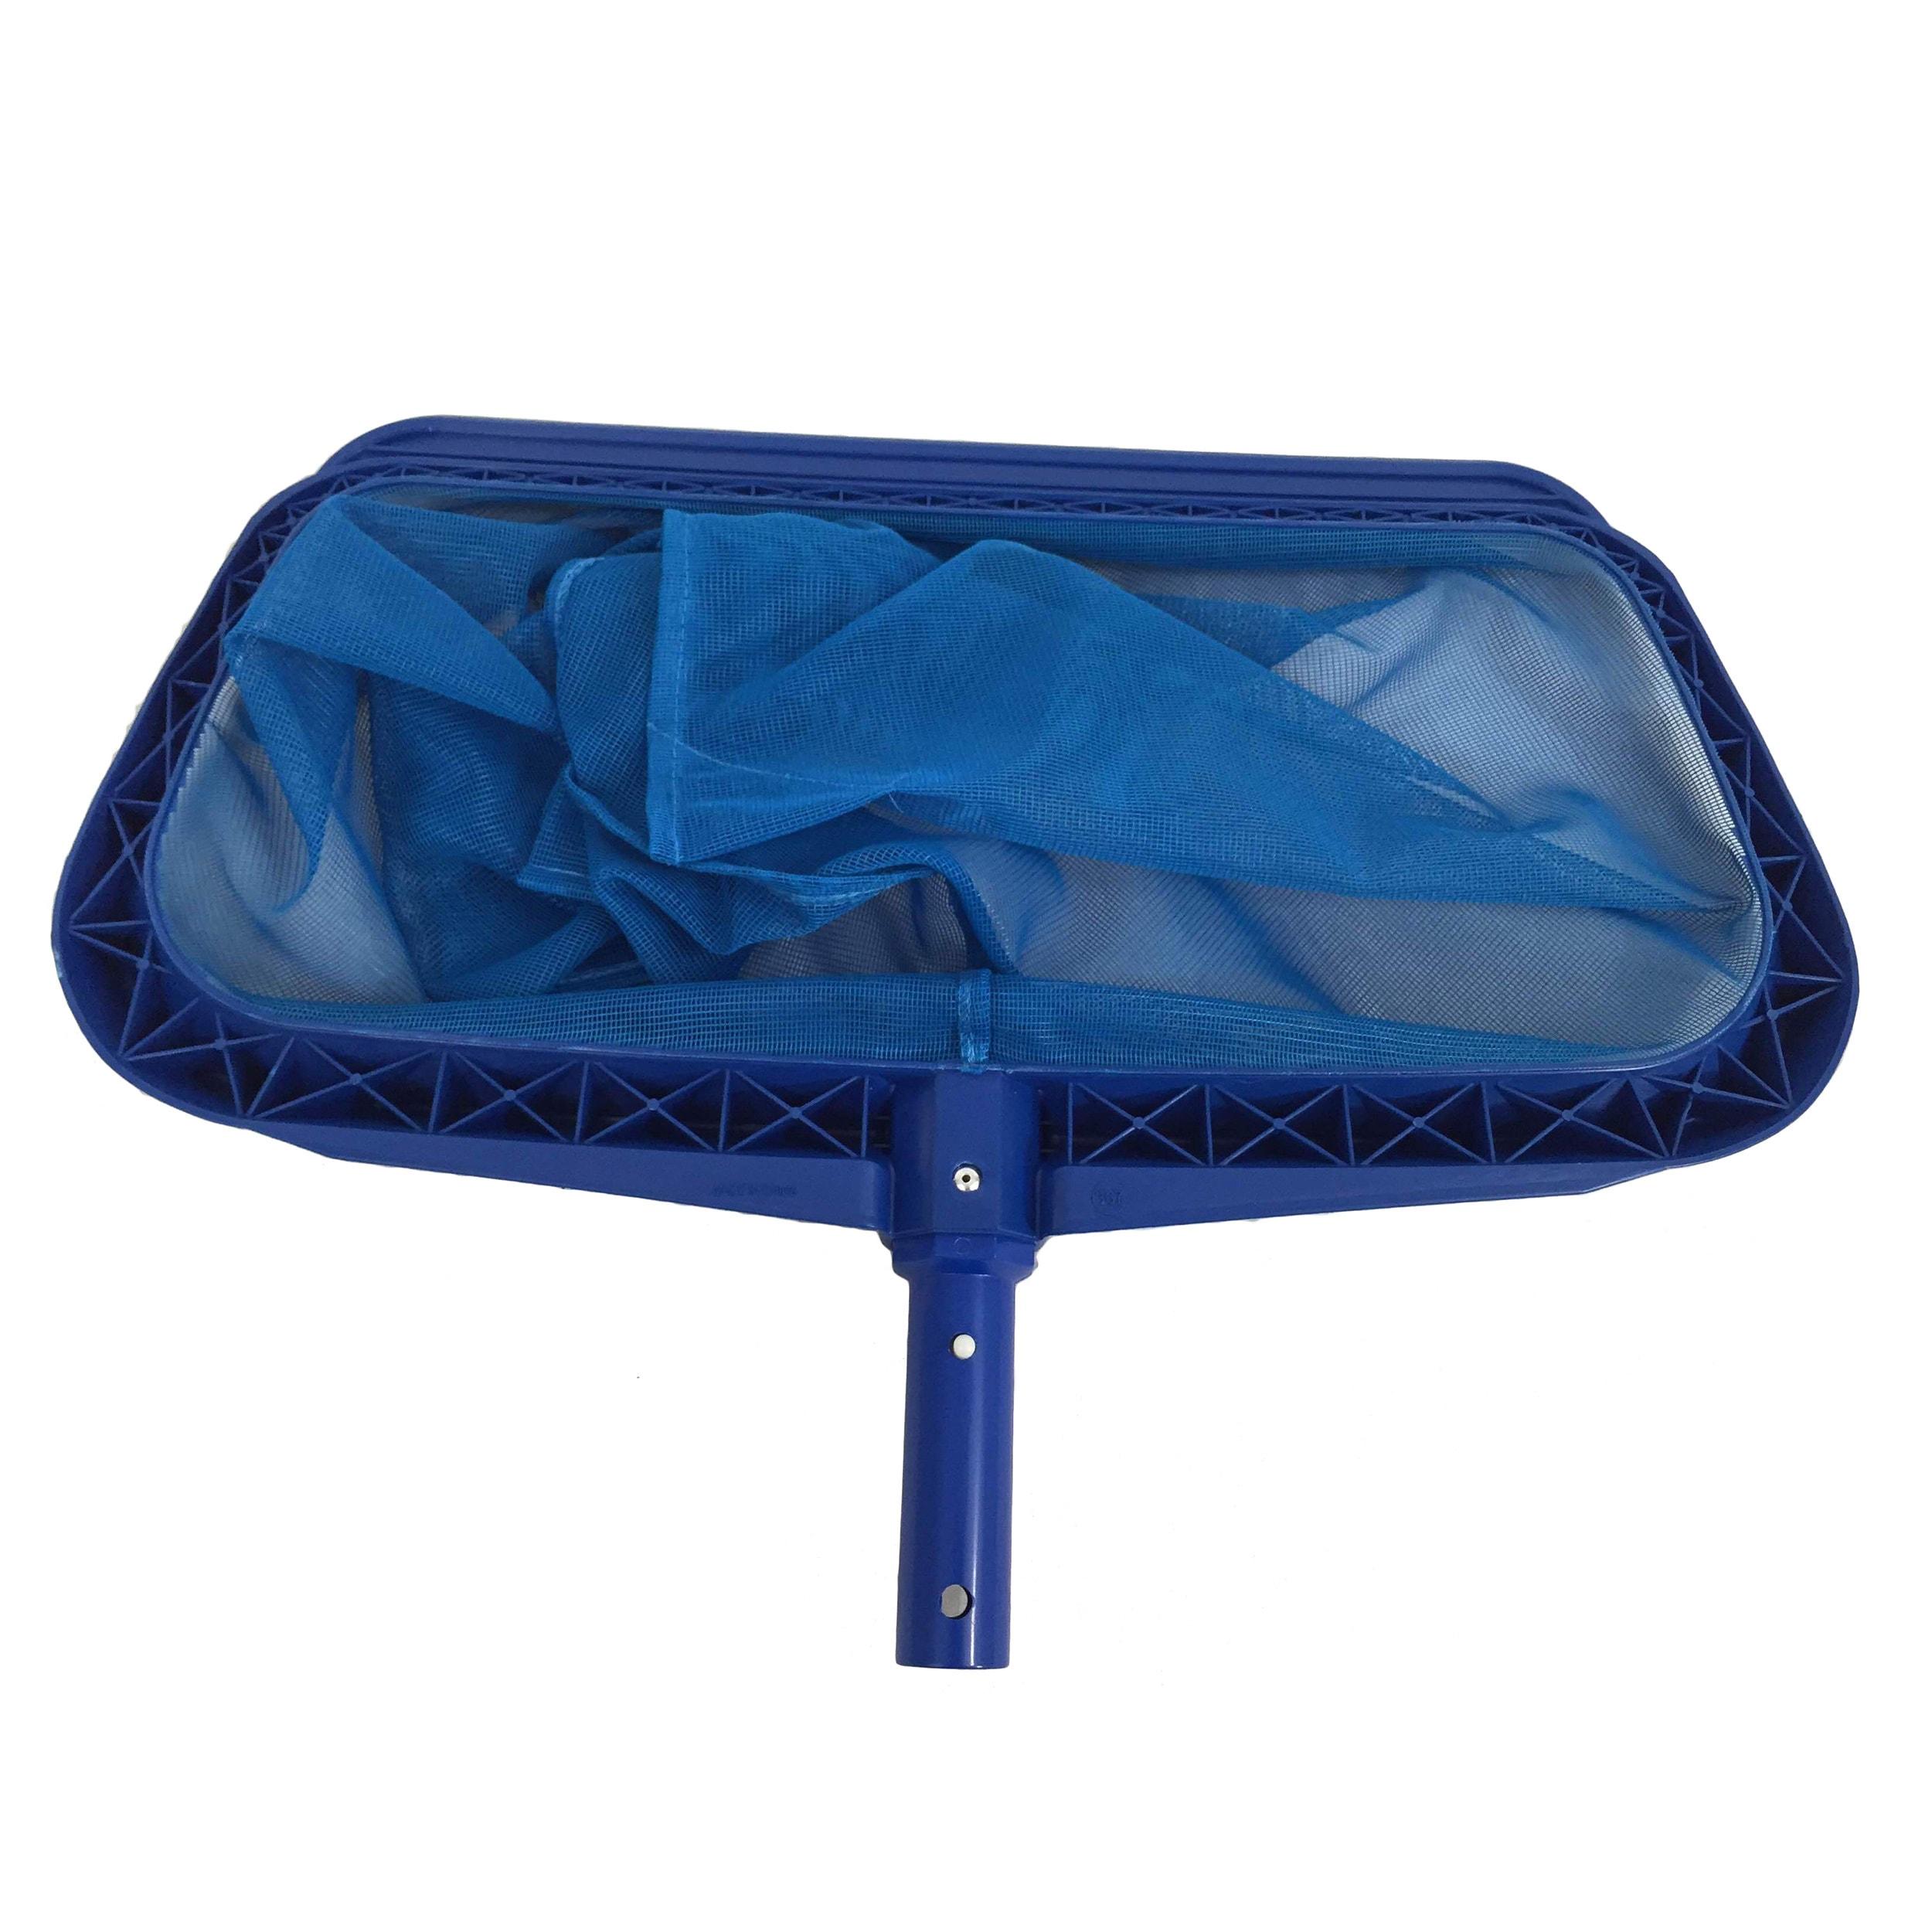 Robelle Heavy Duty Leaf Rake for Swimming Pools (Heavy Du...